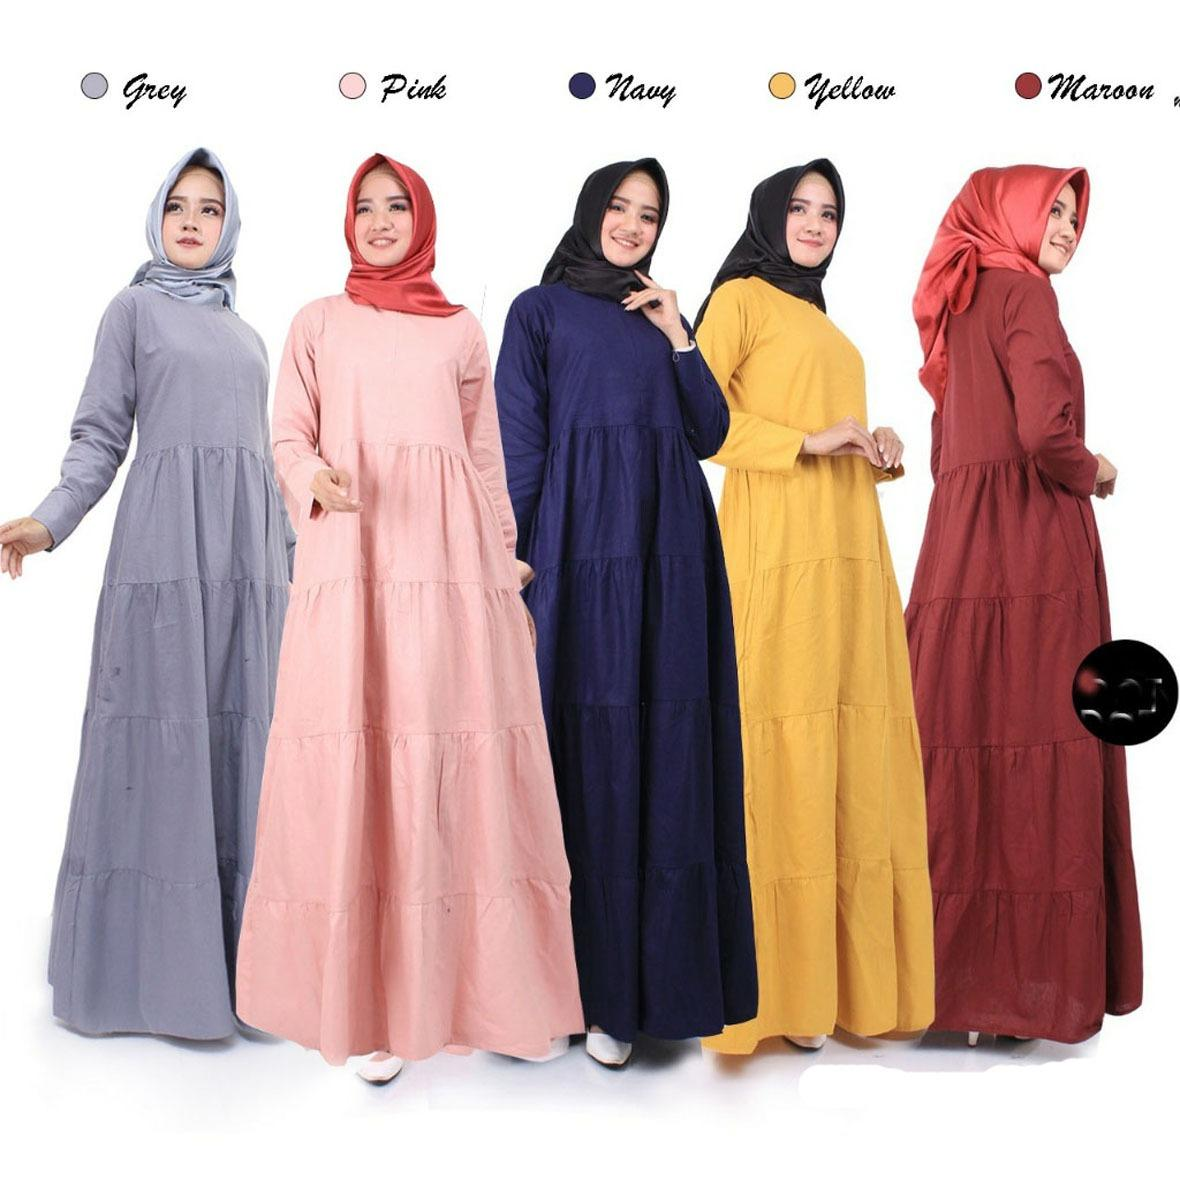 CIPITIHOLIC Baju Gamis Tanpa Hijab Linen Ramy G236 - Ada Sleting Depan Untuk Busui